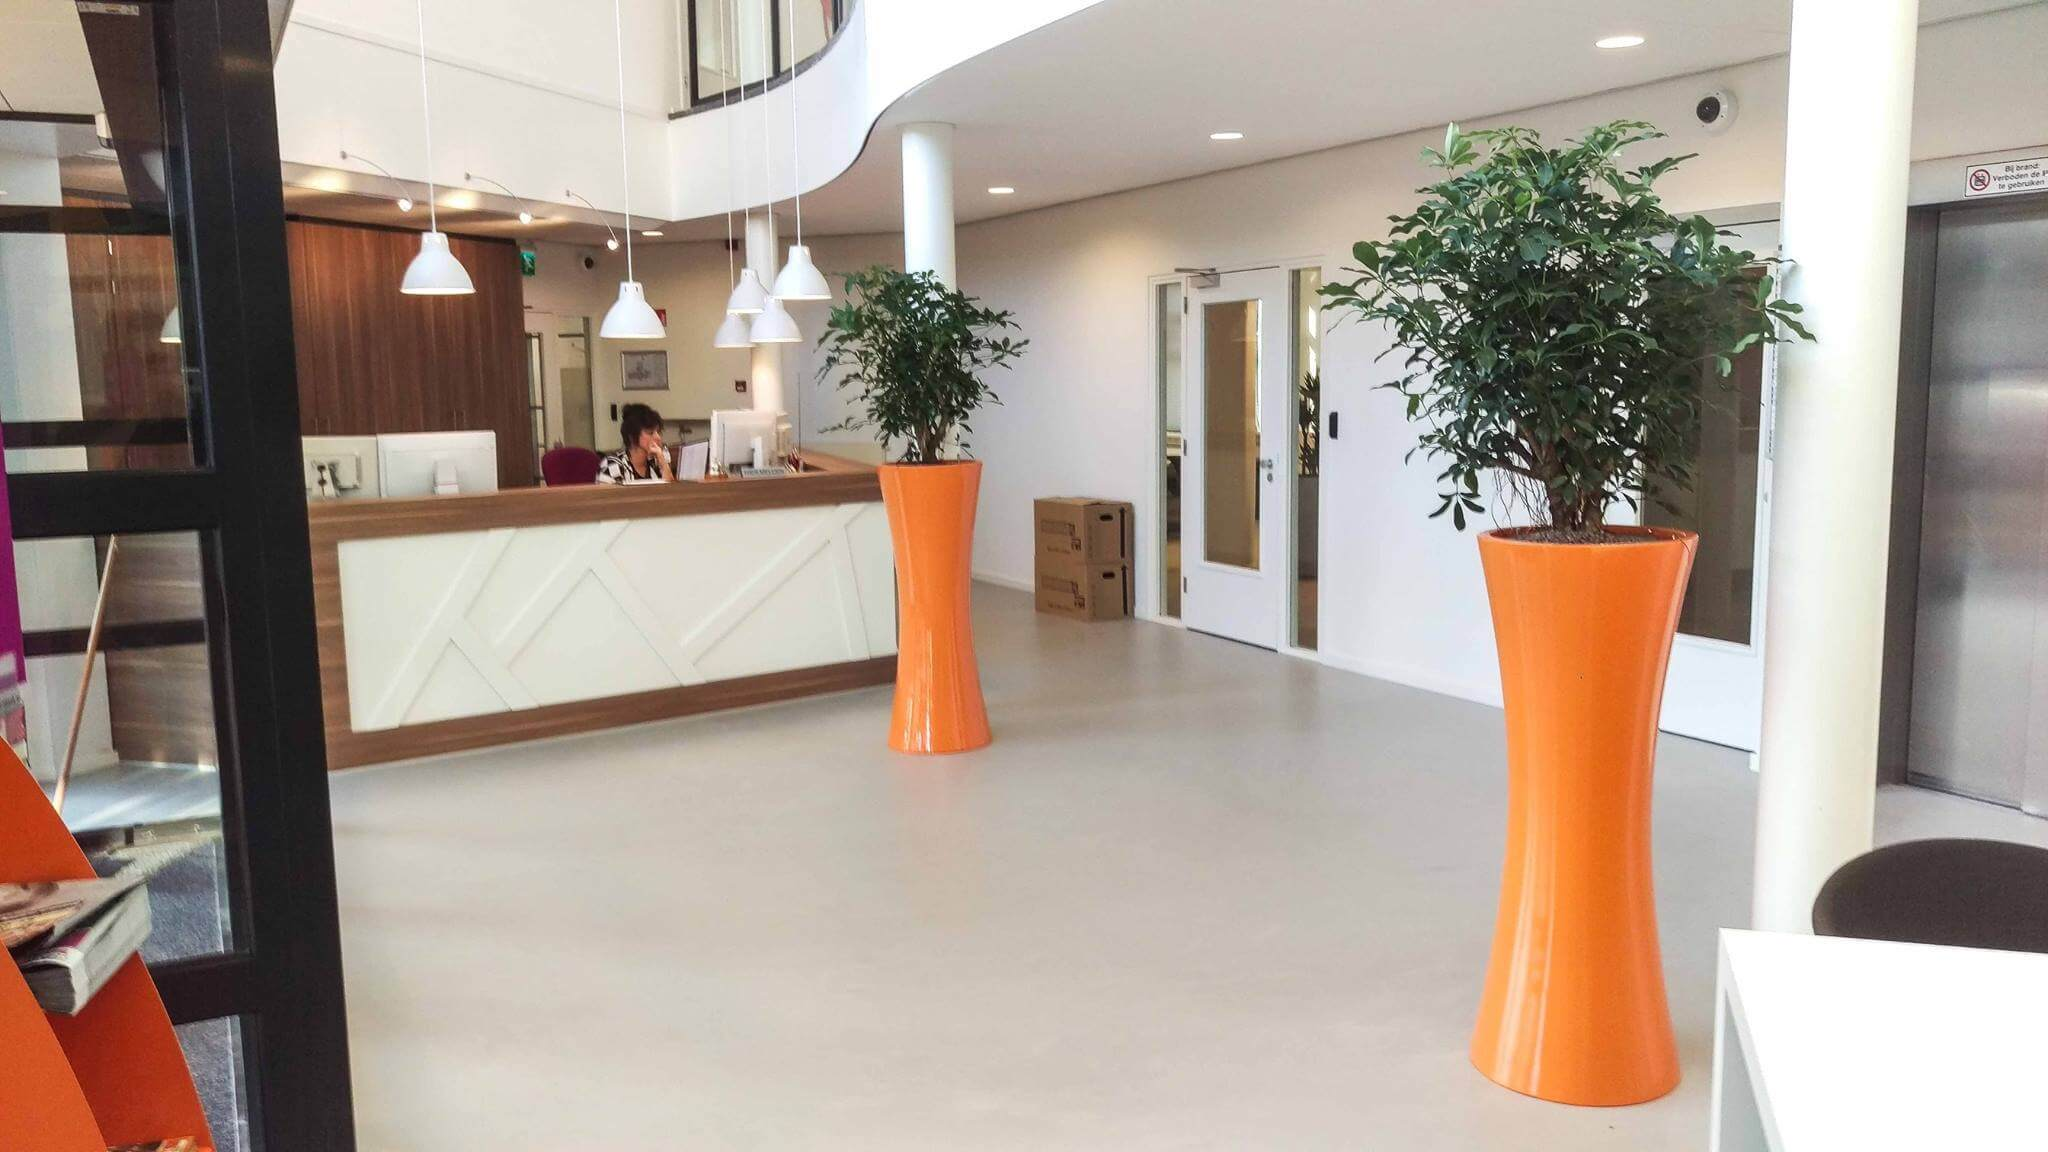 Oranje plantenbakken